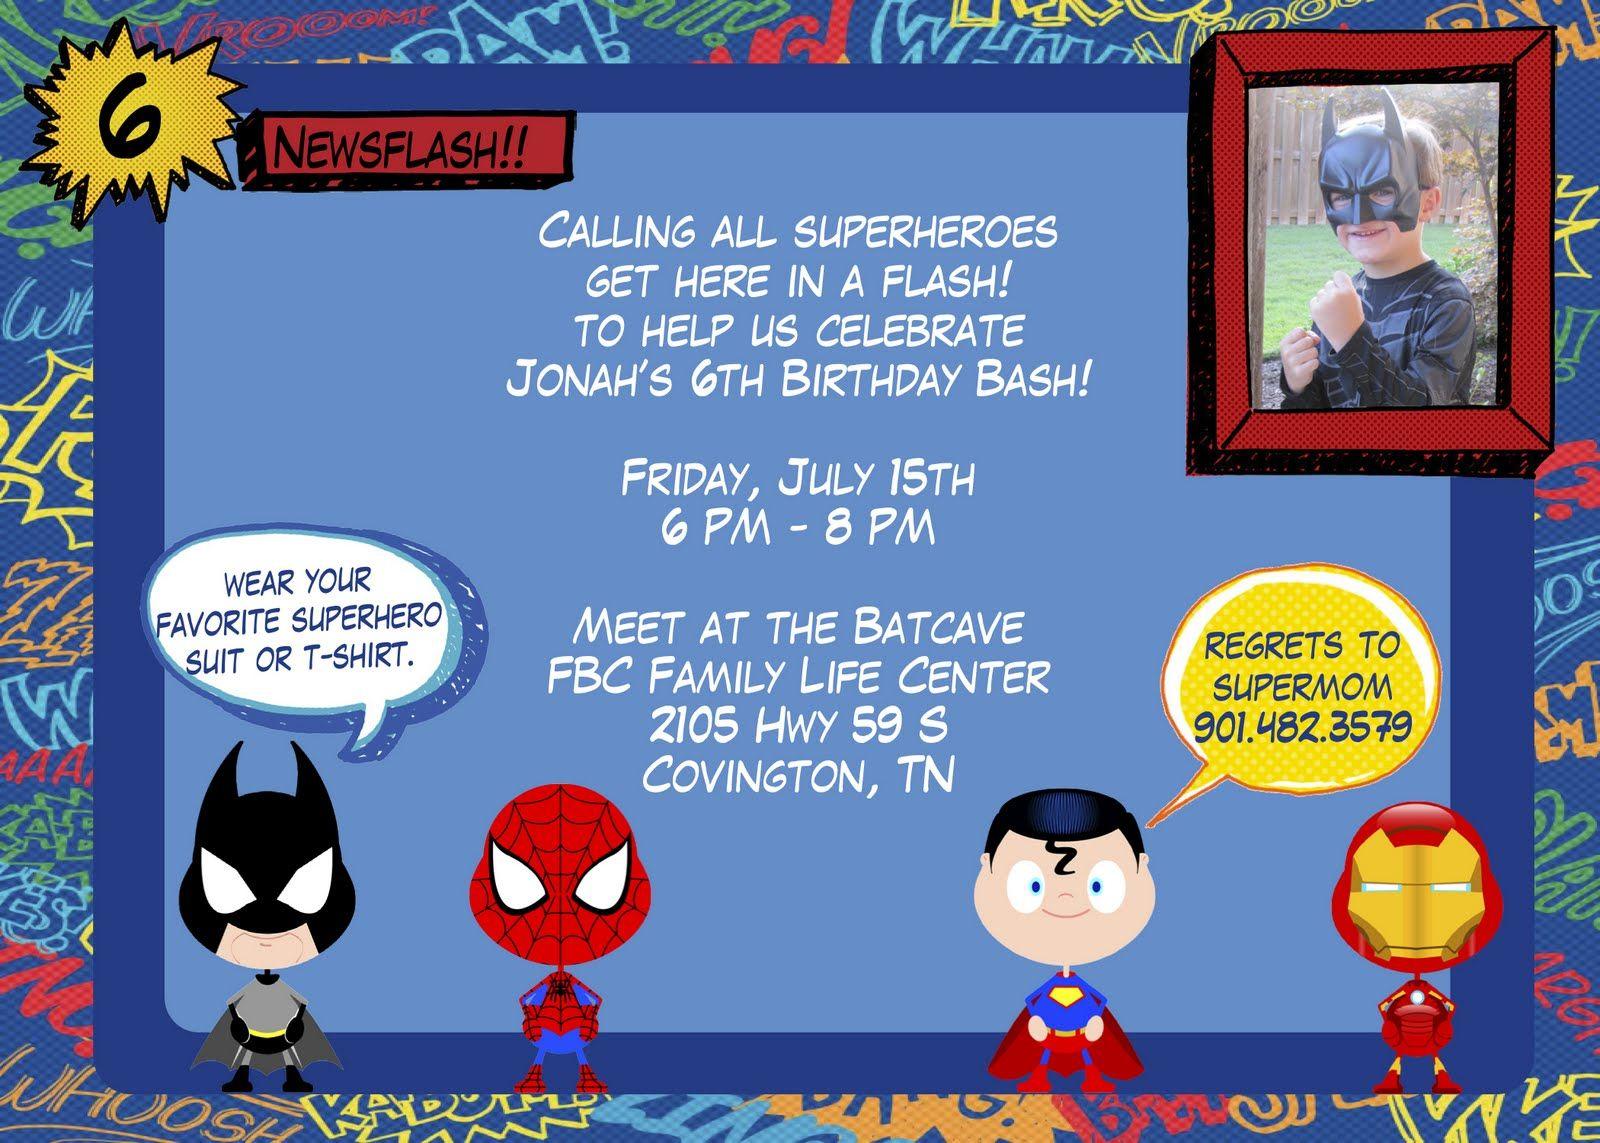 Superhero Birthday Party Invitations Templates Free – Superhero Party Invitation